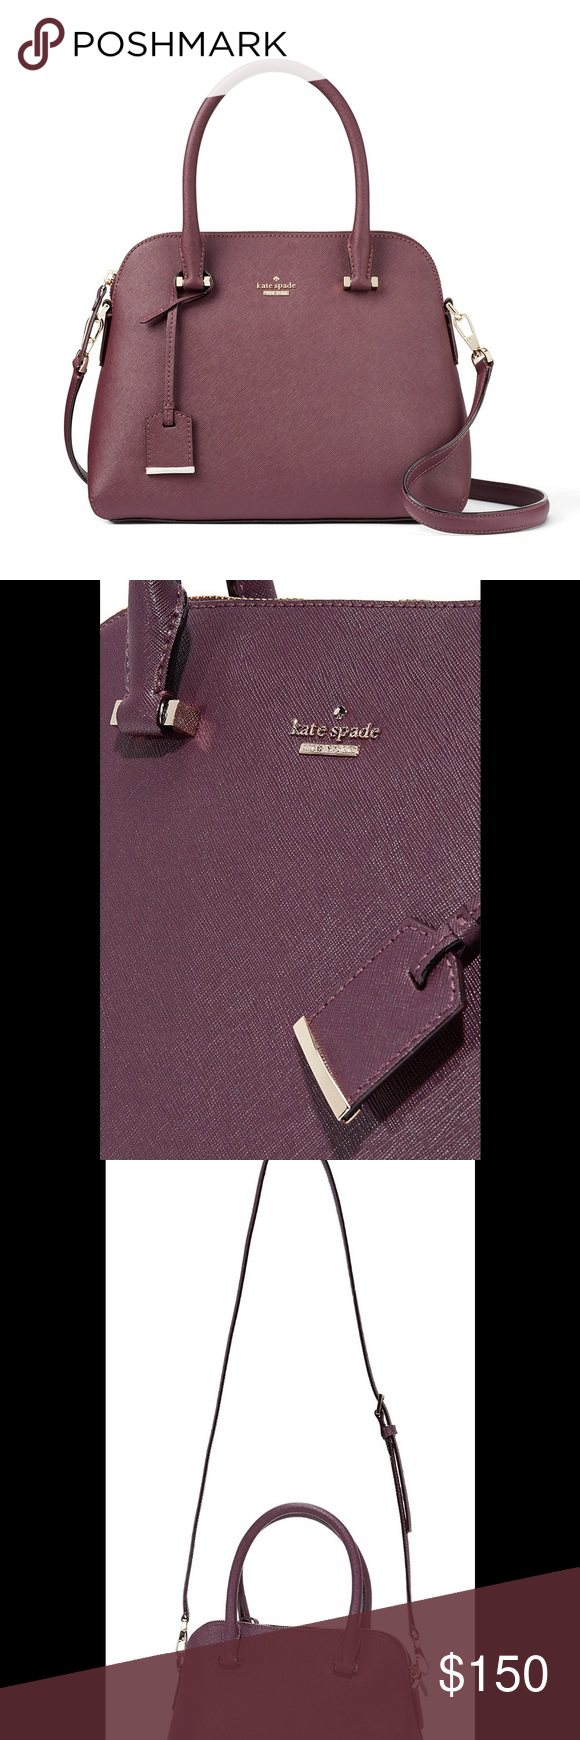 Kate Spade Deep Plum Shoulder Bag Kate